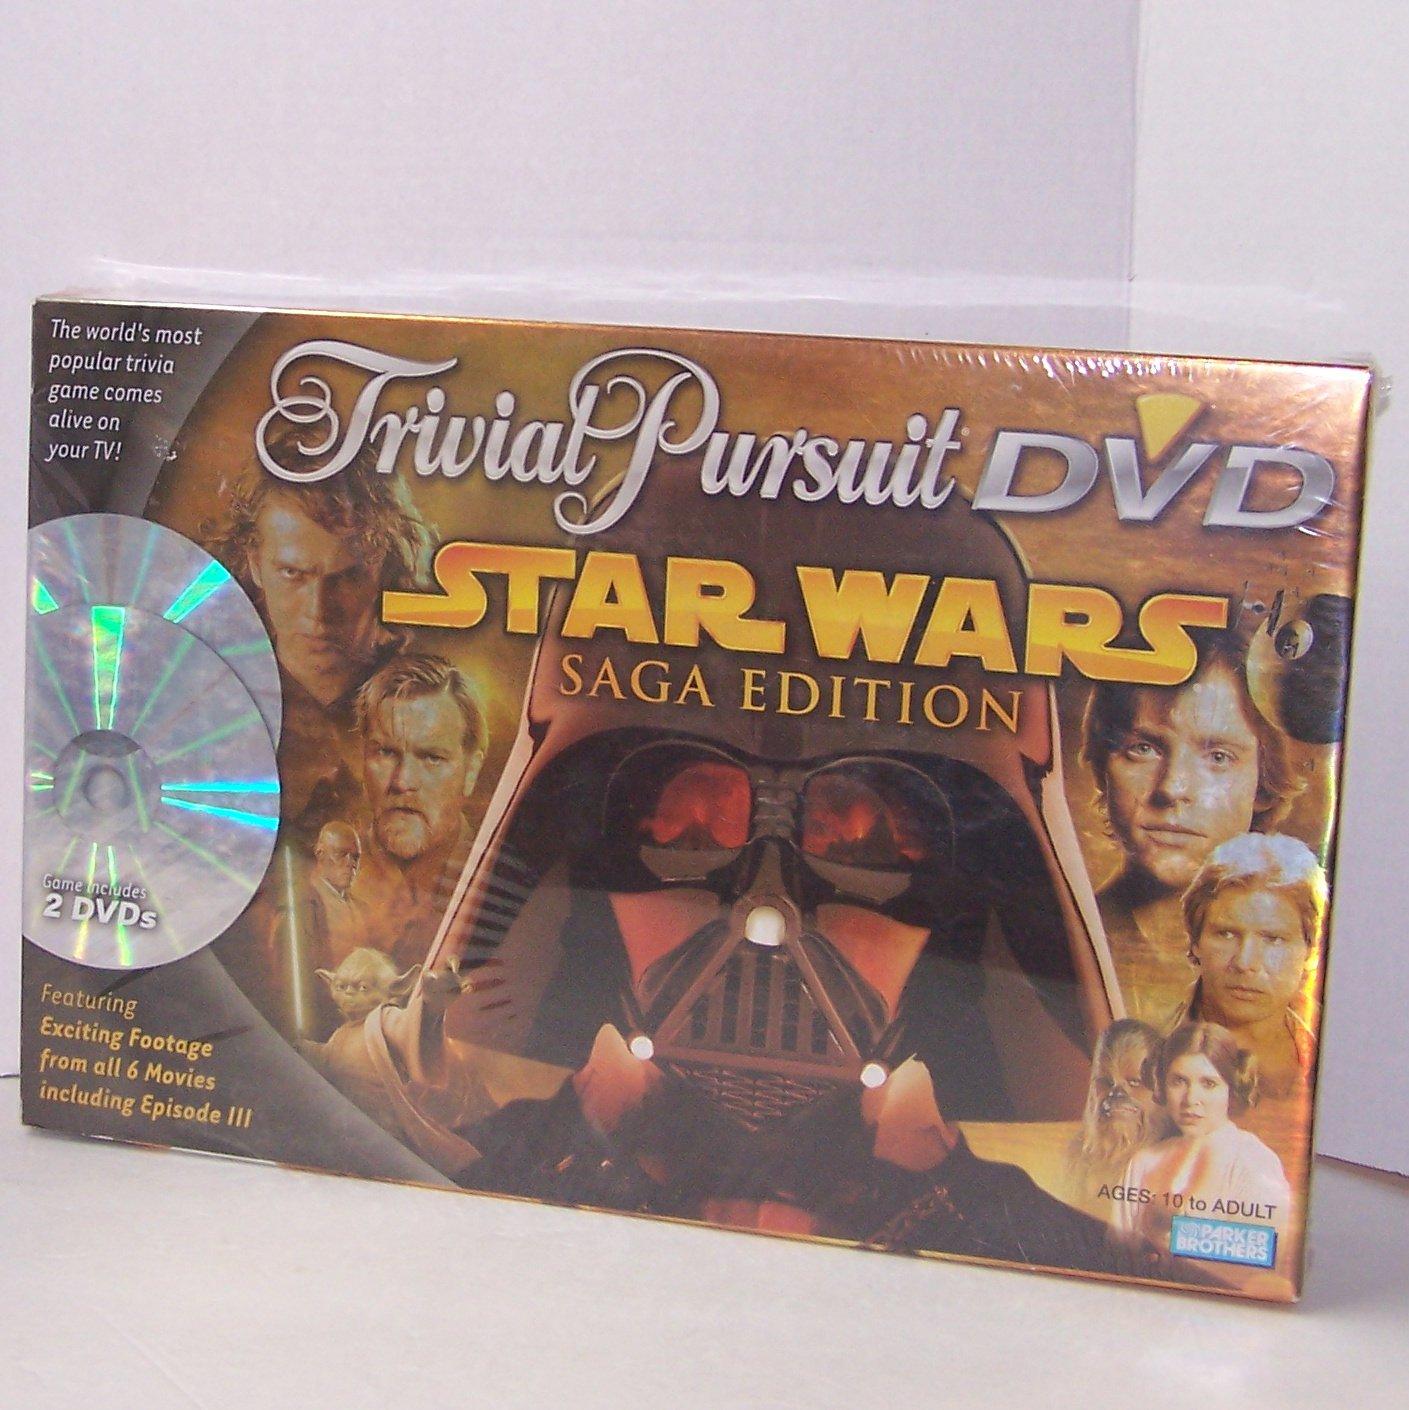 TRIVIAL PURSUIT DVD STAR WARS SAGA EDITION BOARD GAME